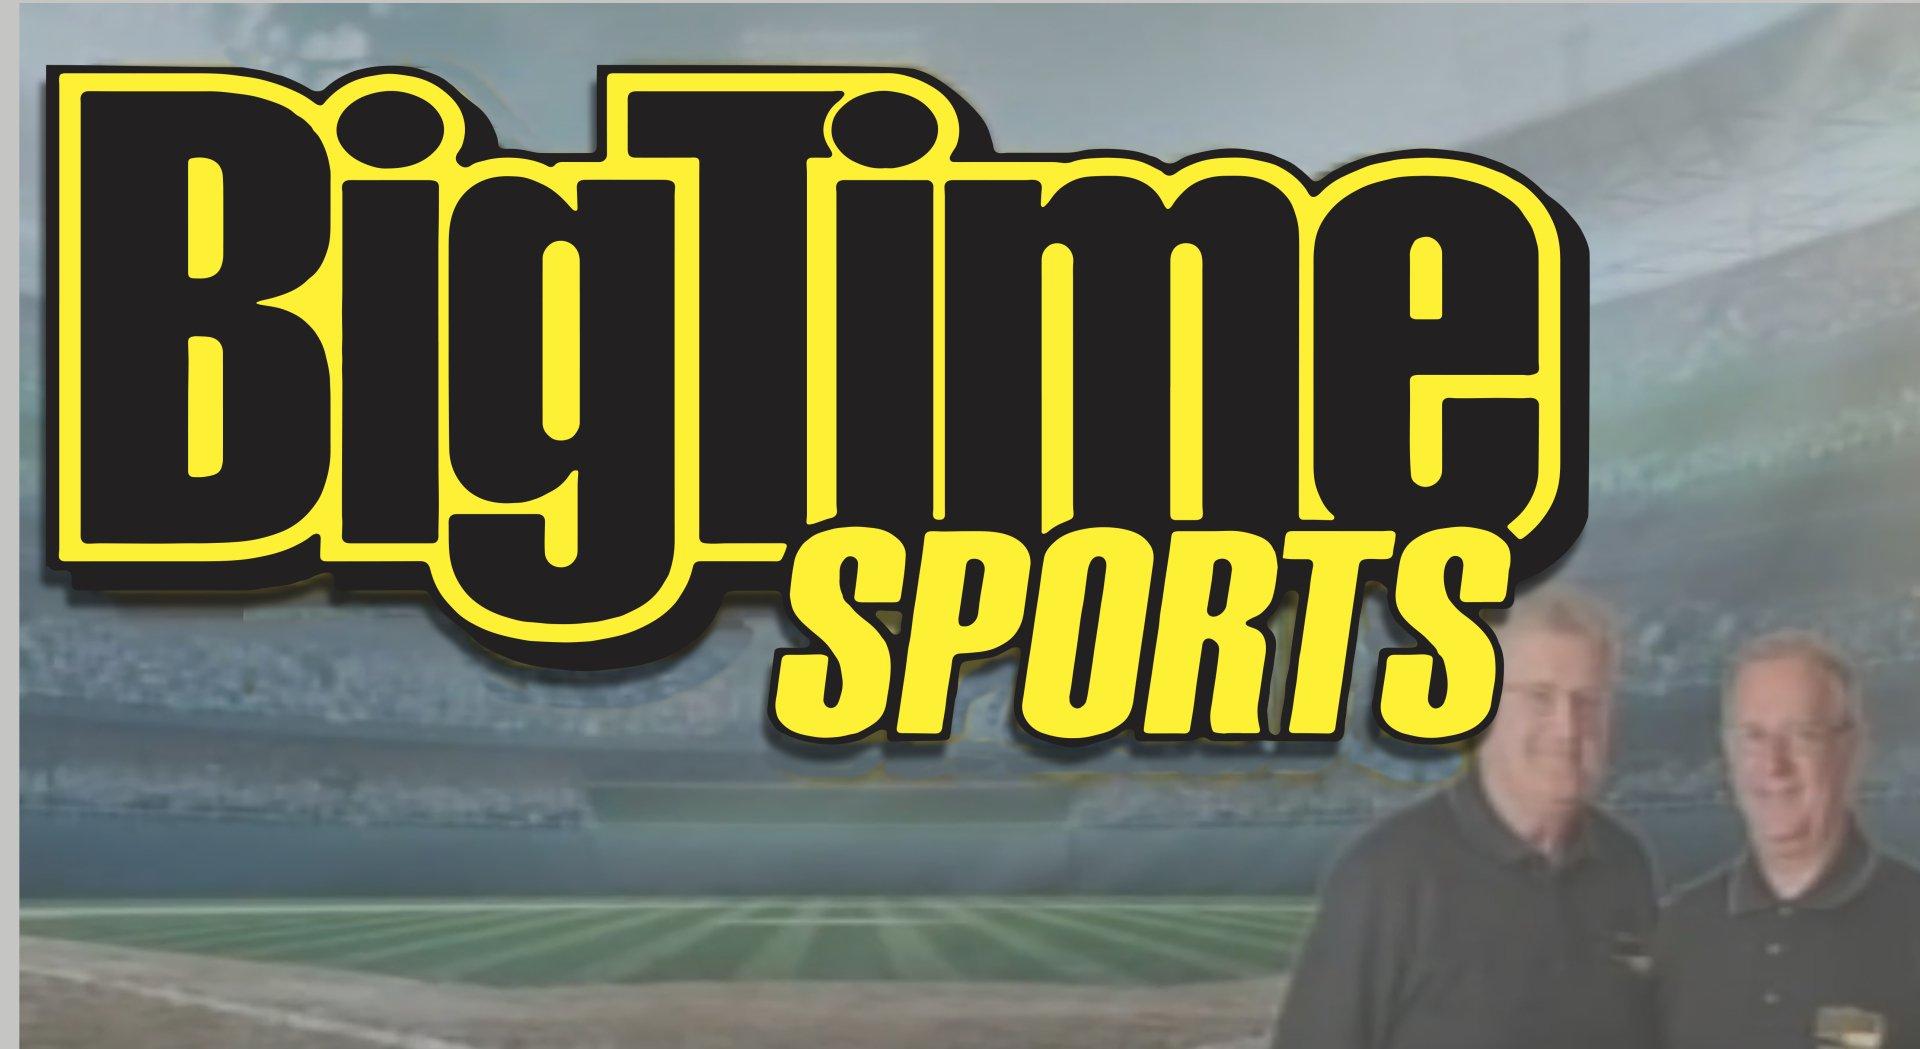 www.bigtimesportsohio.com